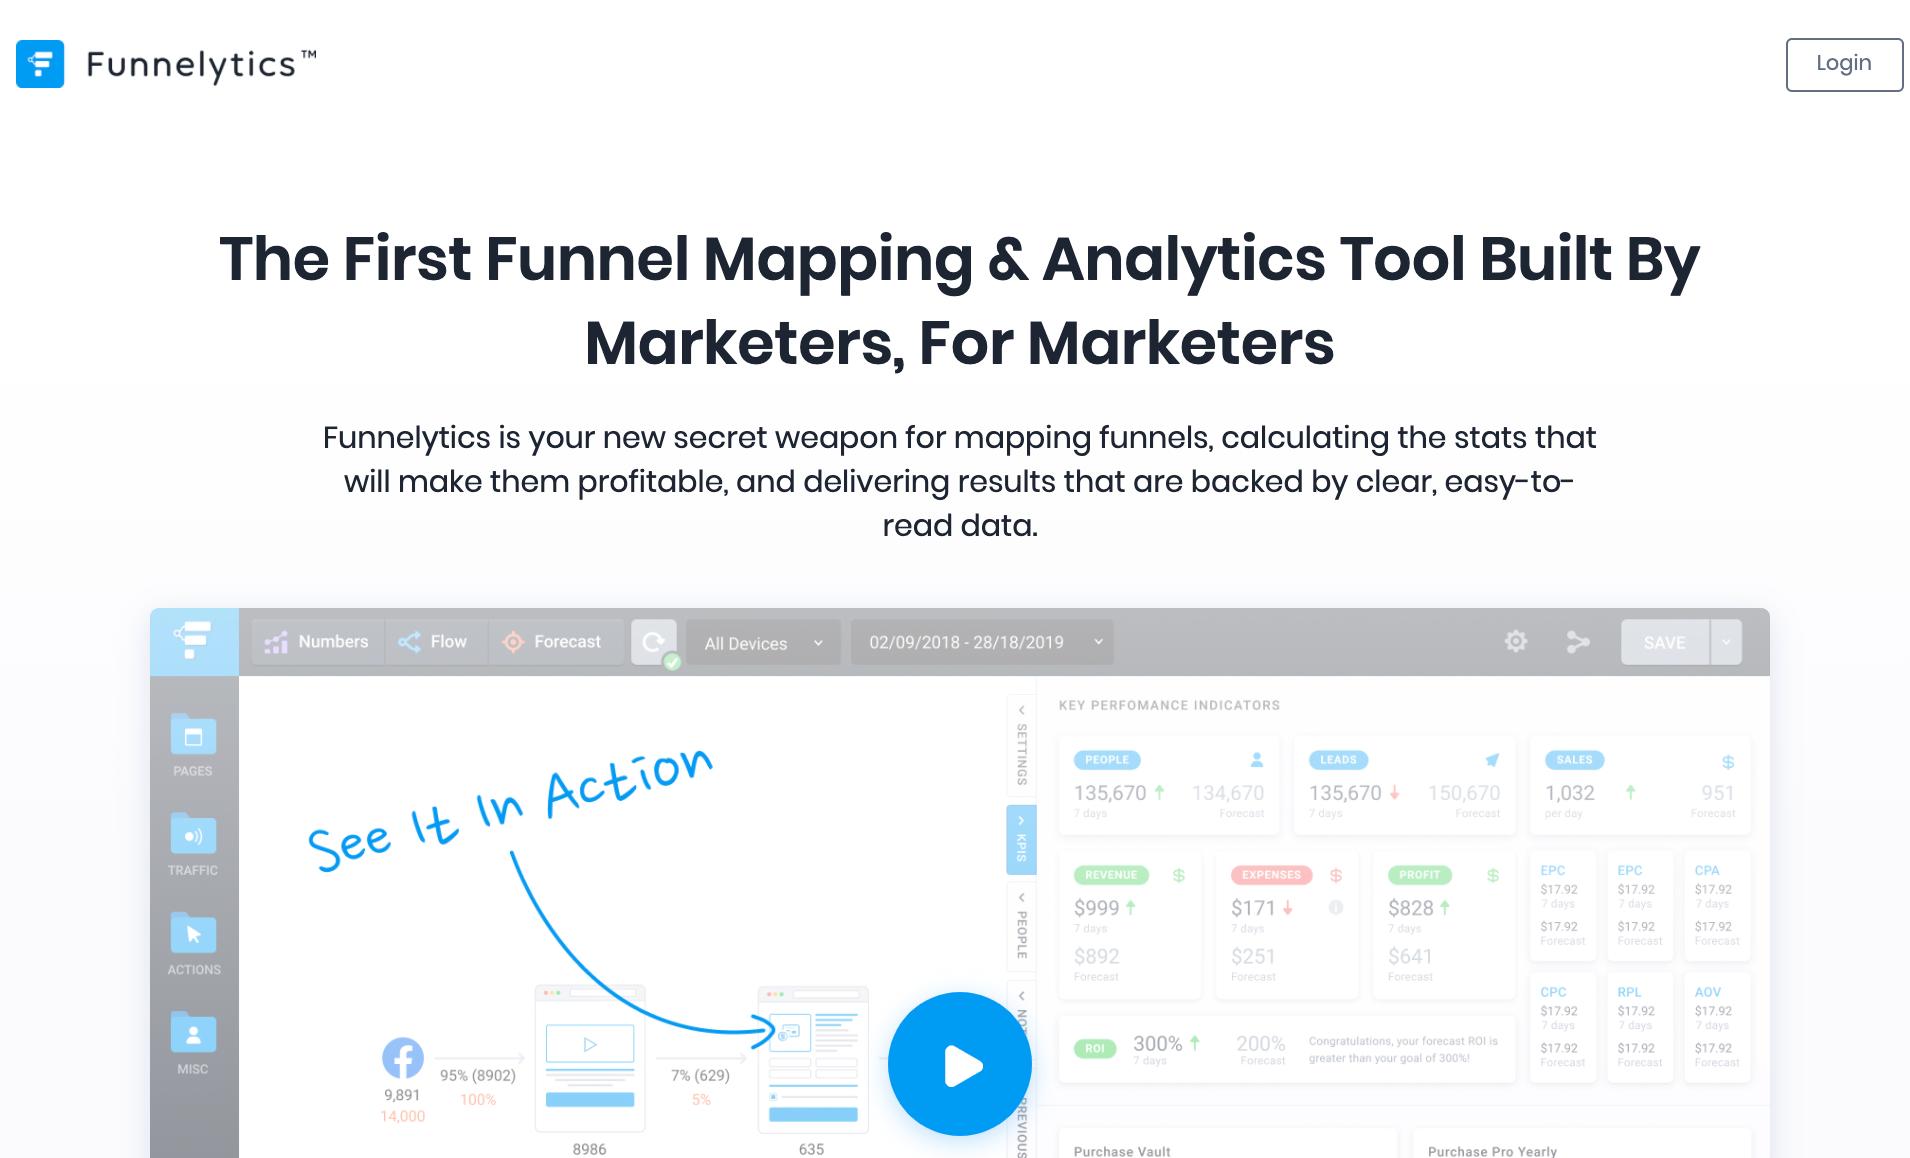 Funnelytics-跟踪和优化您的销售渠道